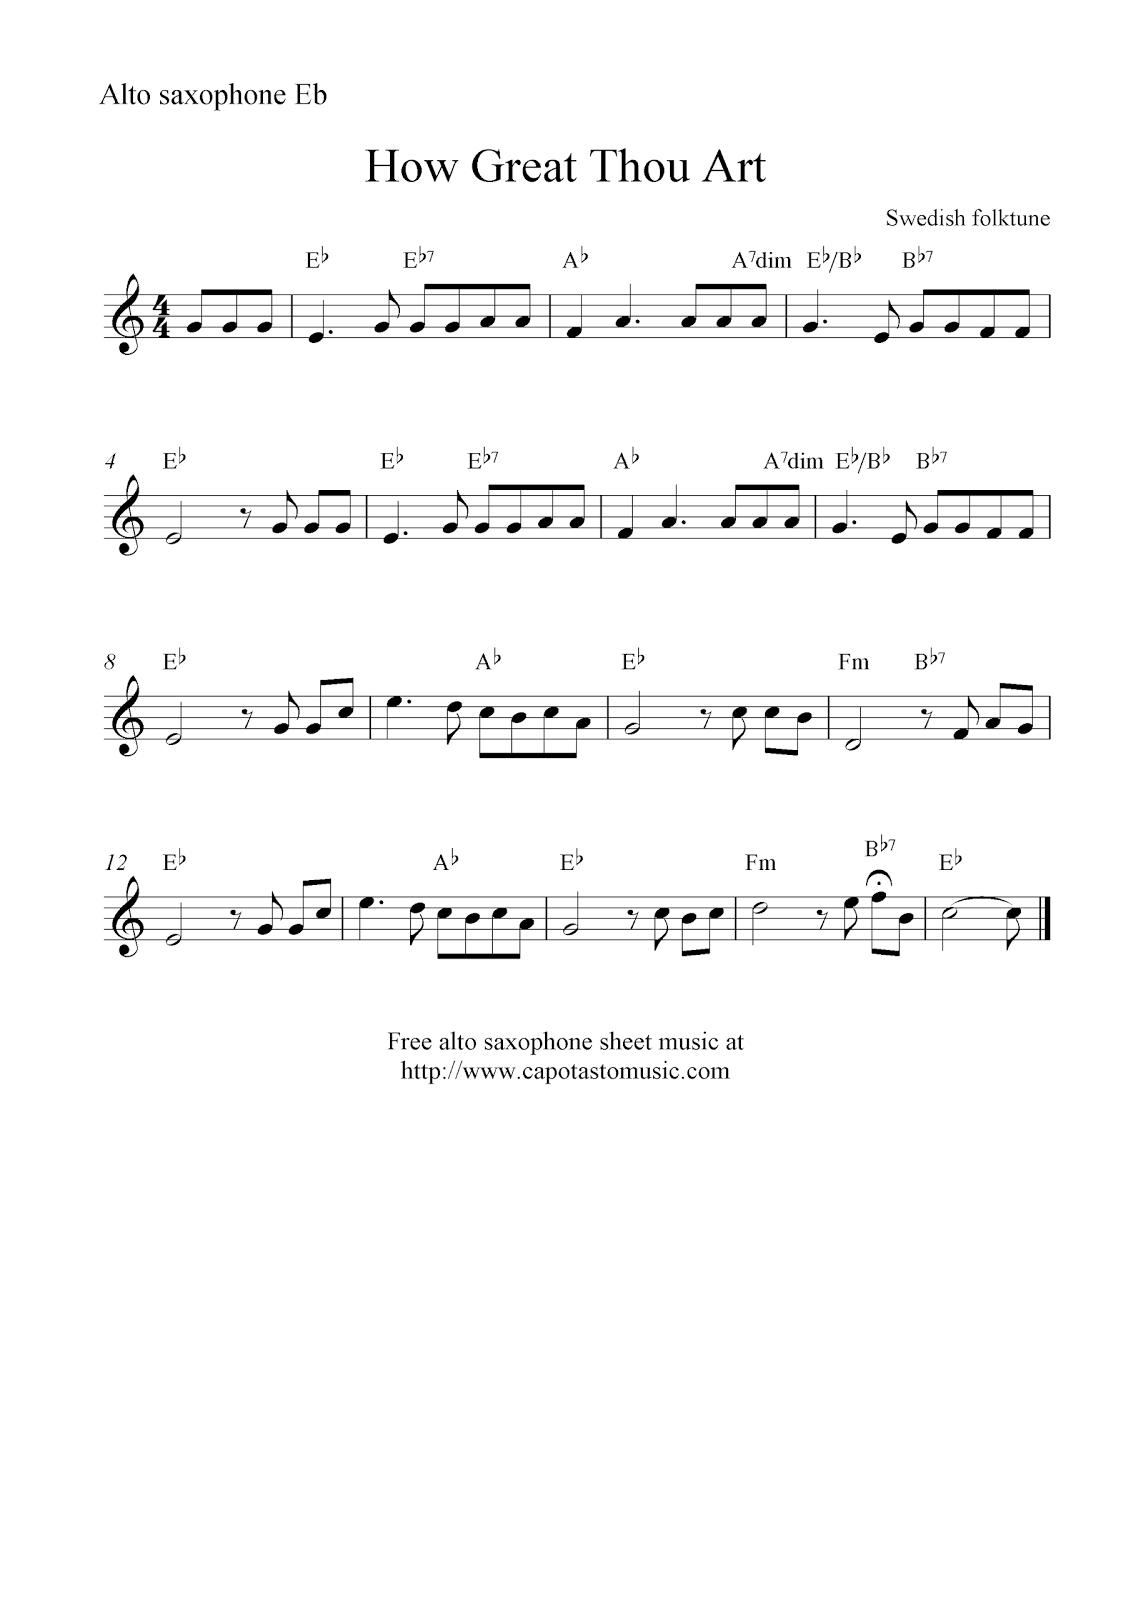 How Great Thou Art, Free Alto Saxophone Sheet Music Notes - Free Printable Alto Saxophone Sheet Music